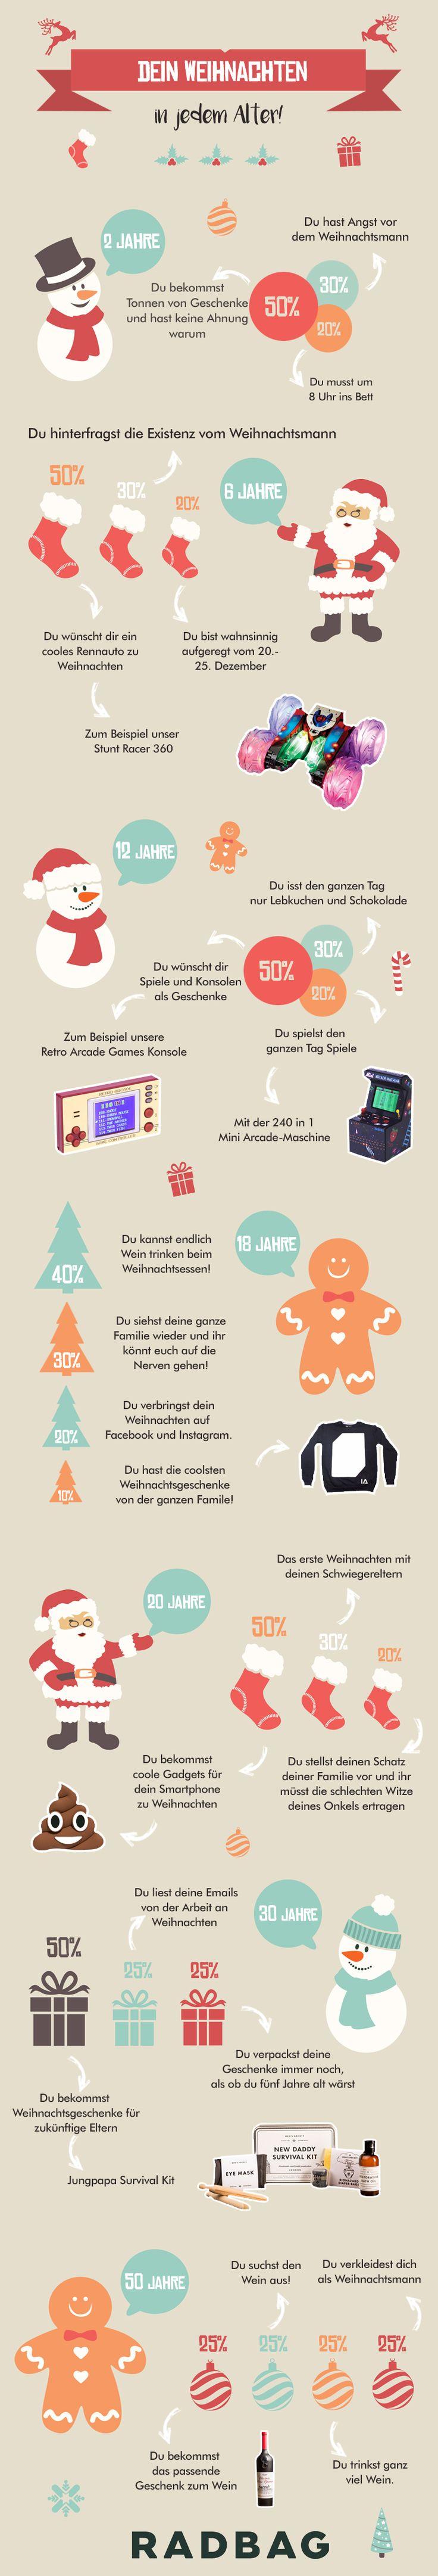 Infografik zu Weihnachten #infografik #infographic #christmas #funnychristmas #fun #humor #christmastime #happychristmas #christmas2017 #weihnachten #weihnachtszeit #weihnachtsspaß #weihnachtsidee #weihnachtsdeko #infografik #witzig #lustig #amüsant #weisheit #printable #freeprintable #xmastime #xmas #xmashumor #weihnachten